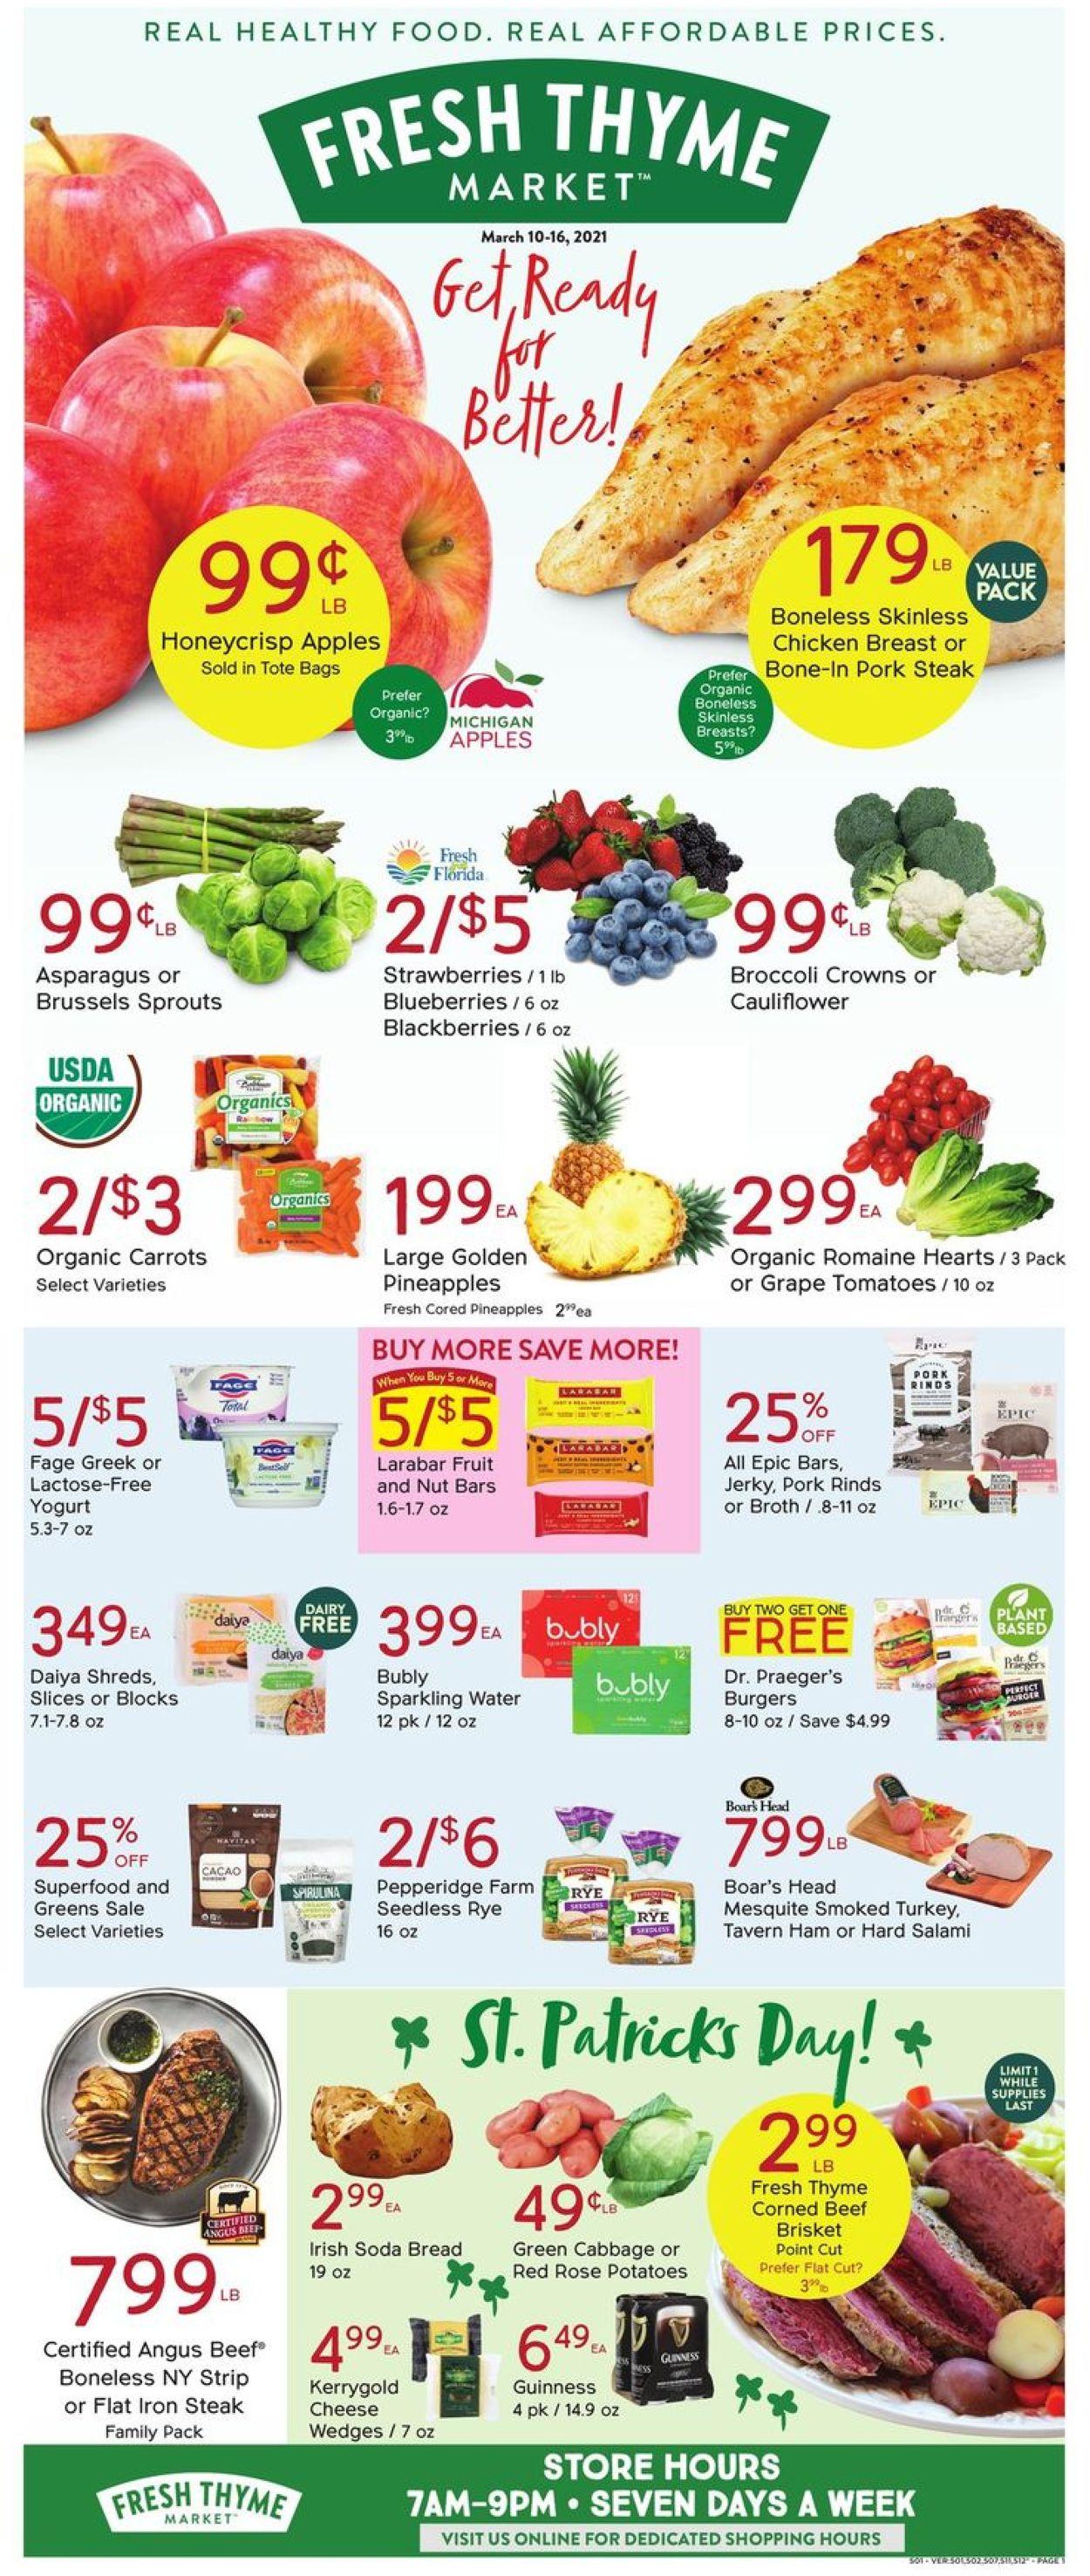 Fresh Thyme Weekly Ad Circular - valid 03/10-03/16/2021